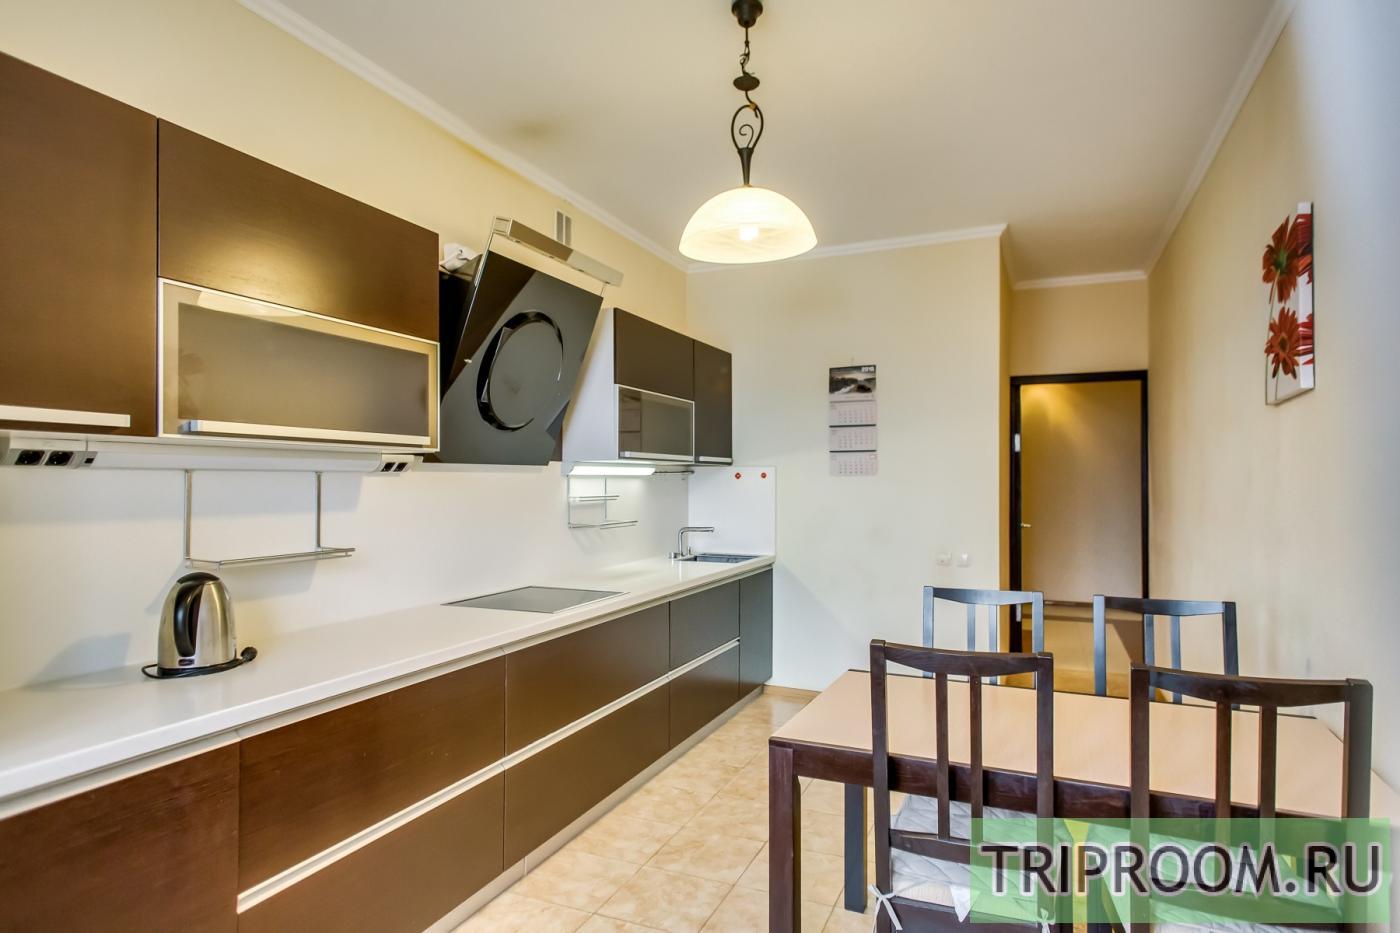 2-комнатная квартира посуточно (вариант № 23730), ул. Максима Горького улица, фото № 12